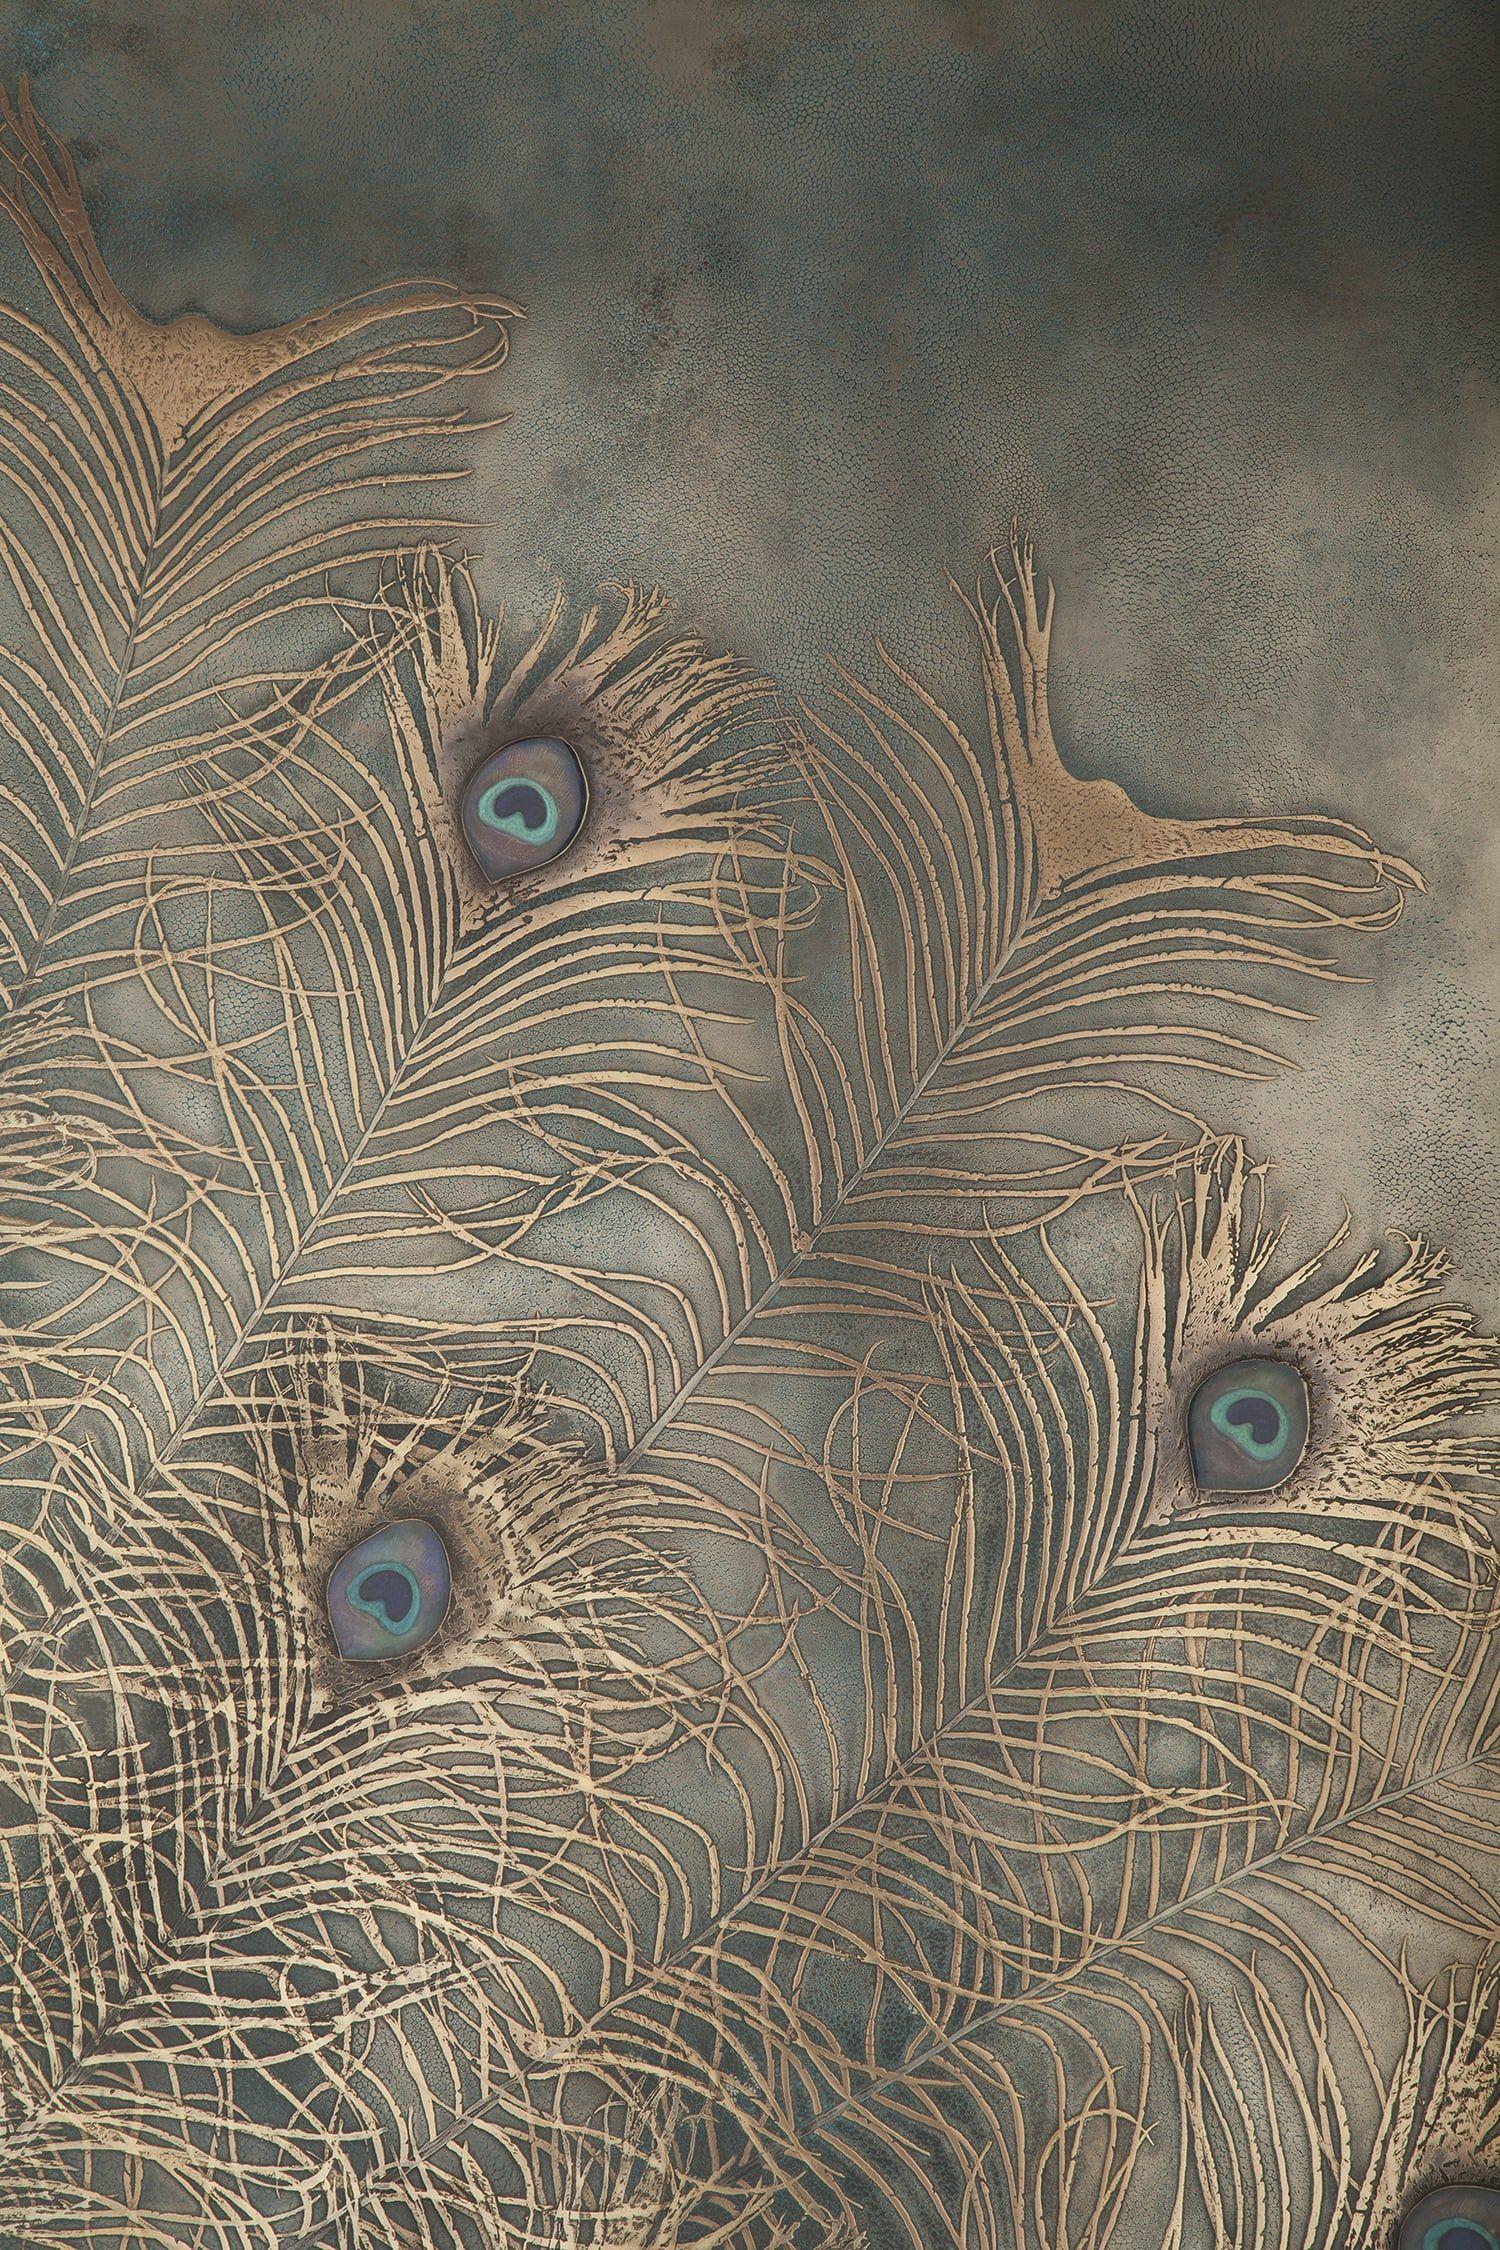 Bronze work peacock detailg basedupon colour